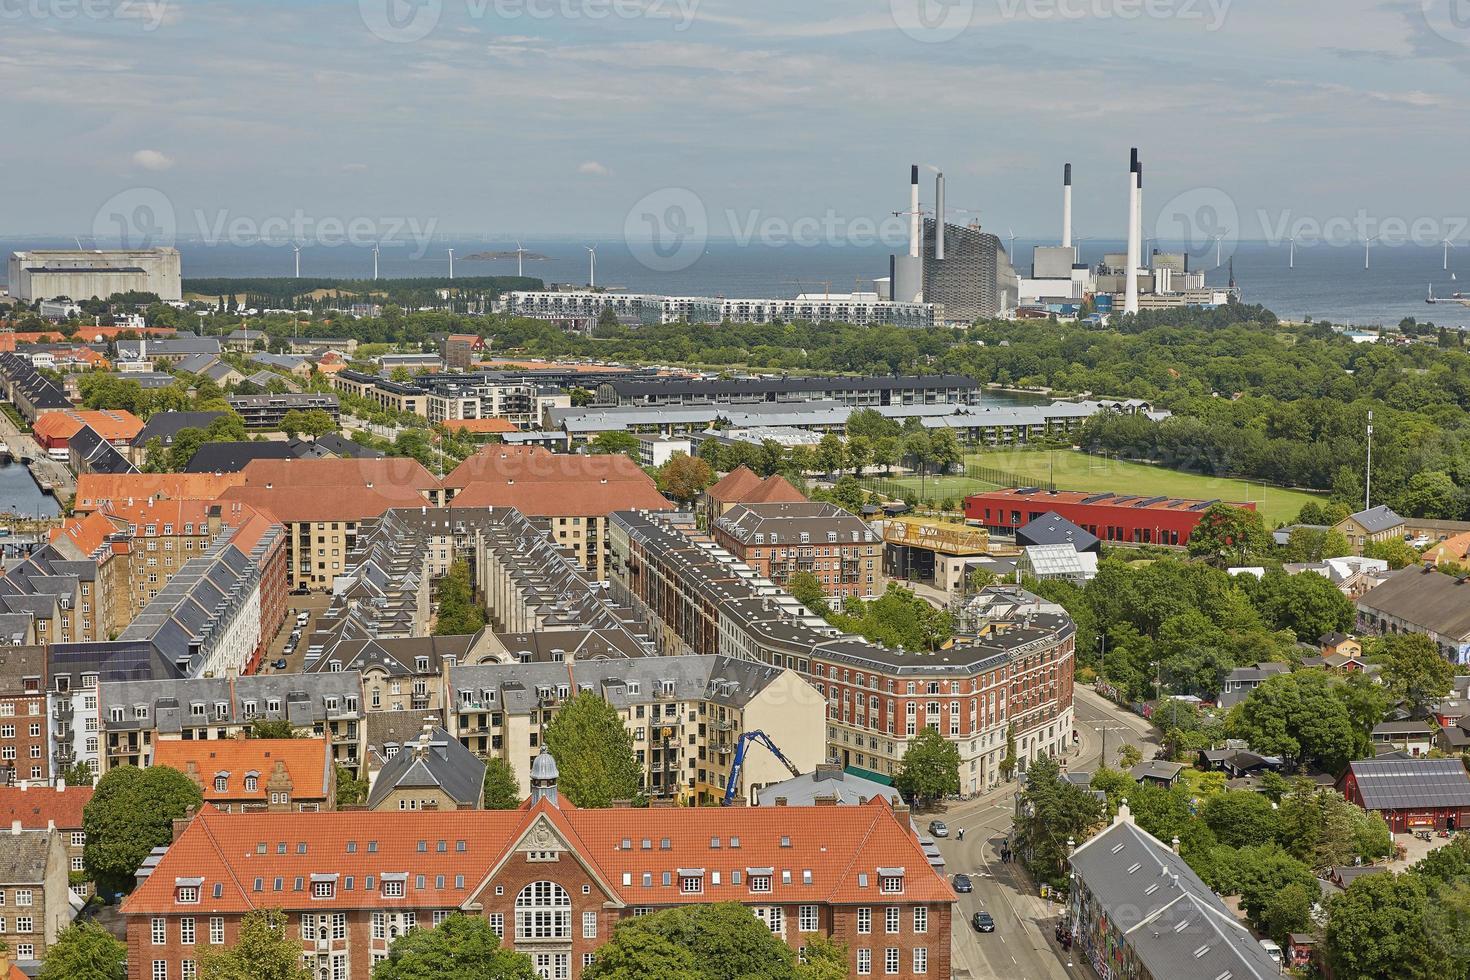 Skyline de la ville scandinave de Copenhague au Danemark pendant une journée nuageuse photo